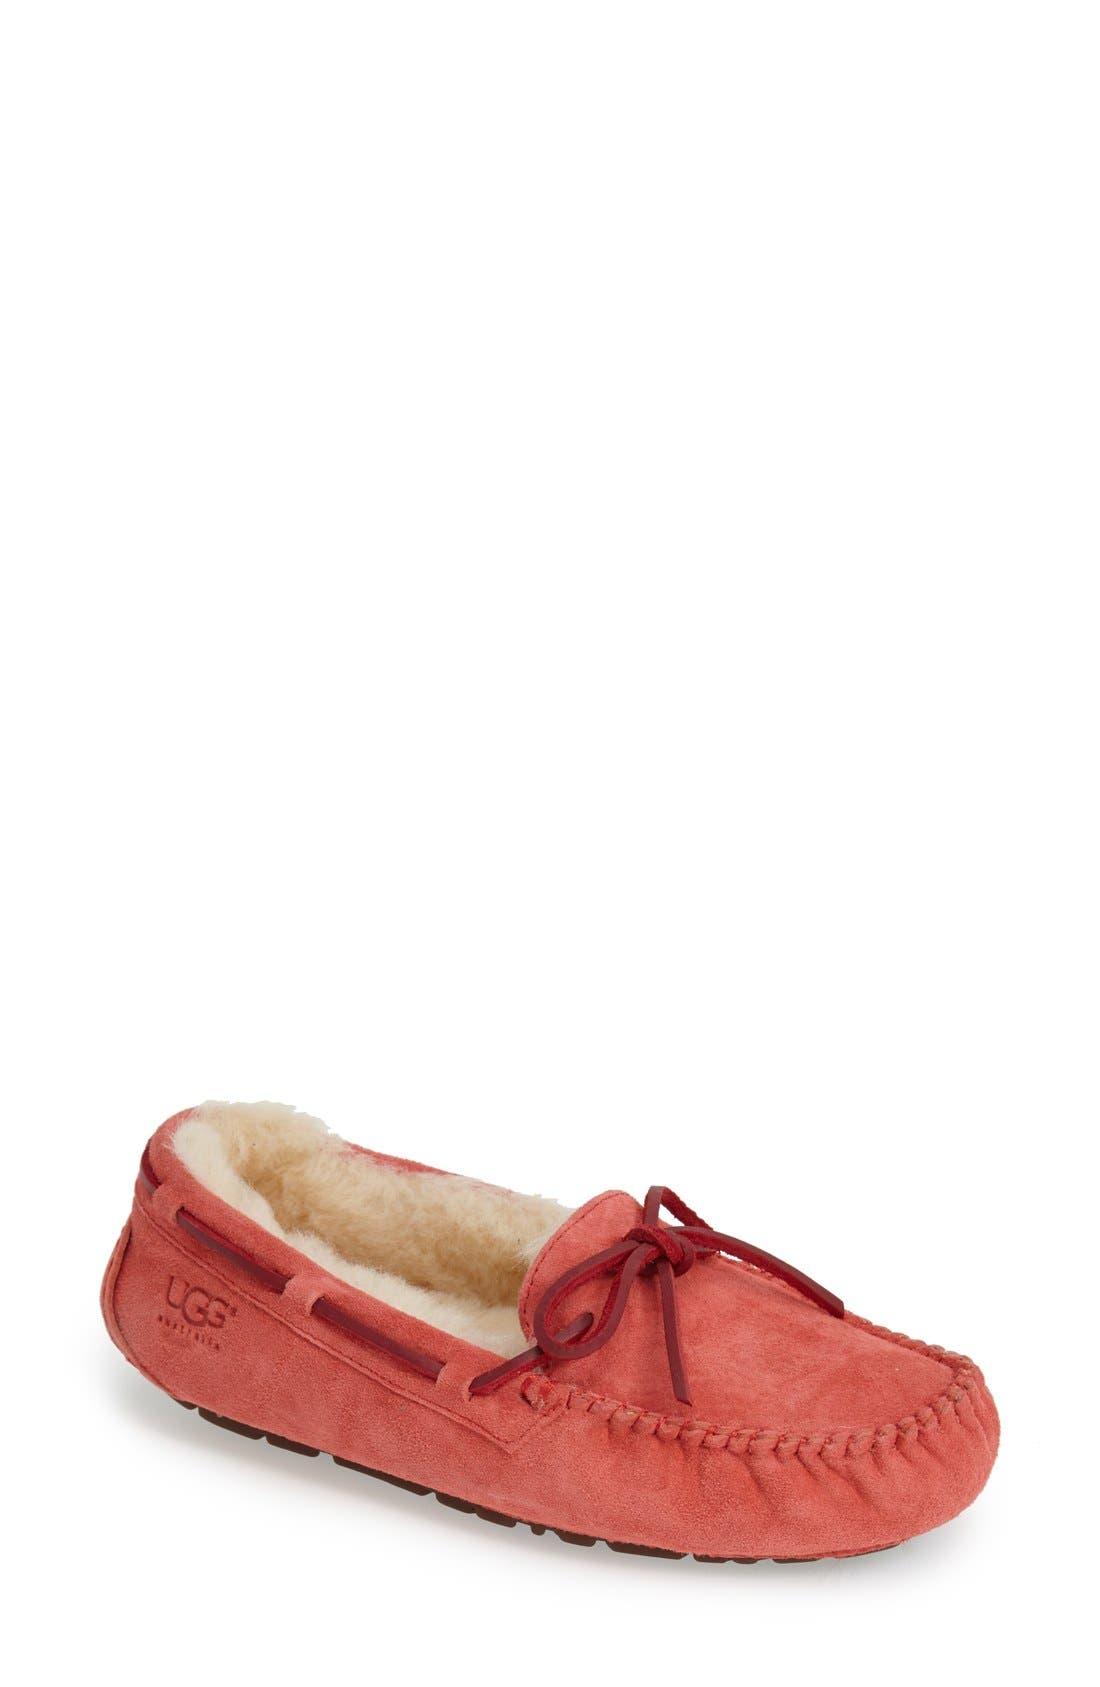 ,                             Dakota Water Resistant Slipper,                             Main thumbnail 257, color,                             650